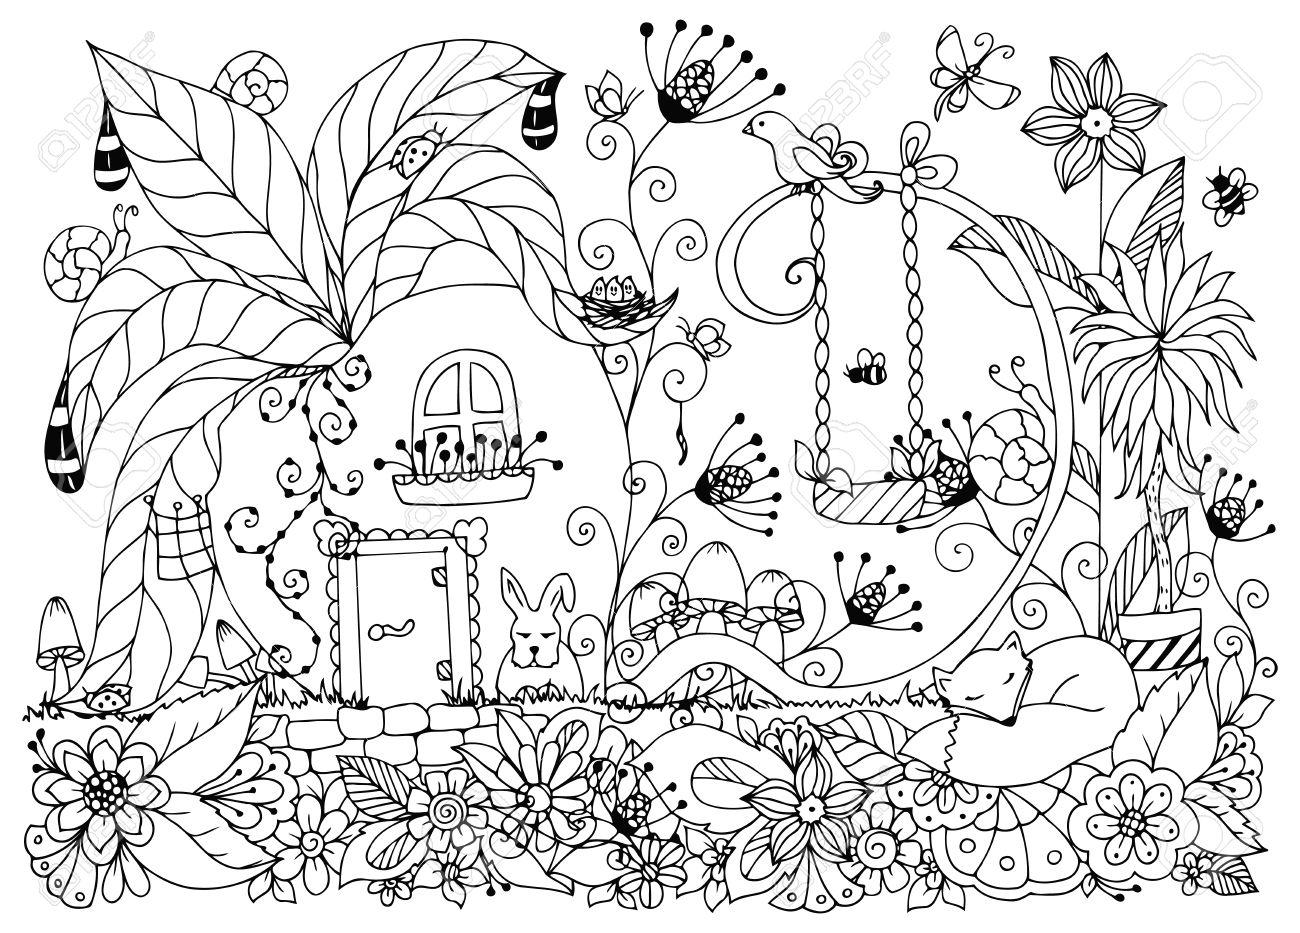 ilustracin vectorial zen enredo casa de rbanos flores de bosquejo jardn naturaleza